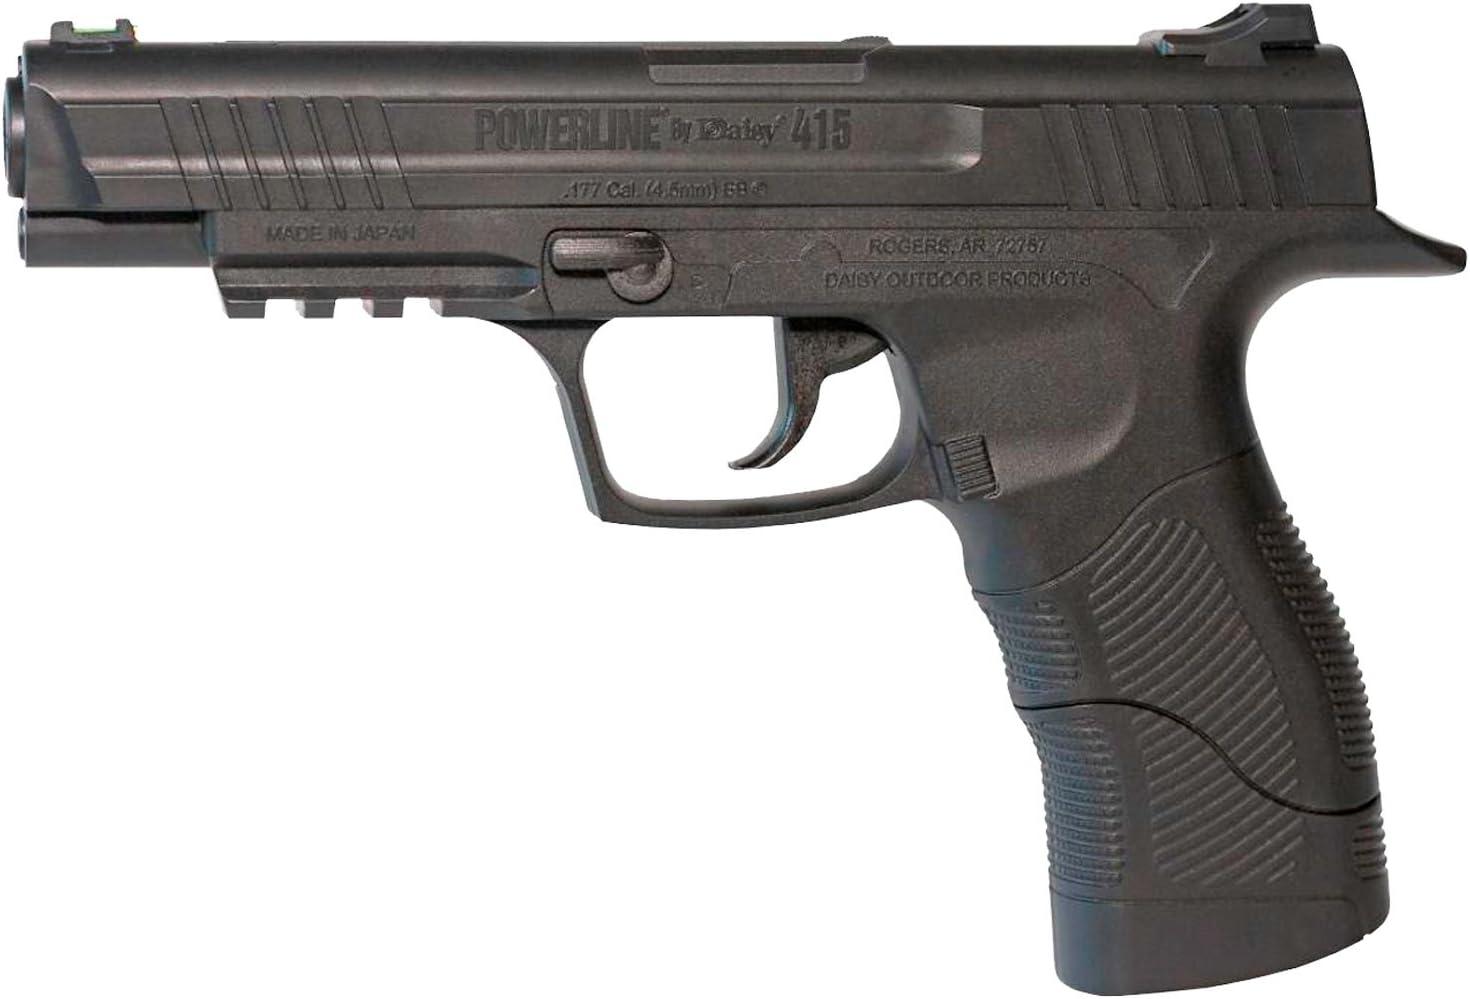 DAISY Pistola 415 CO2 Cal. 4.5